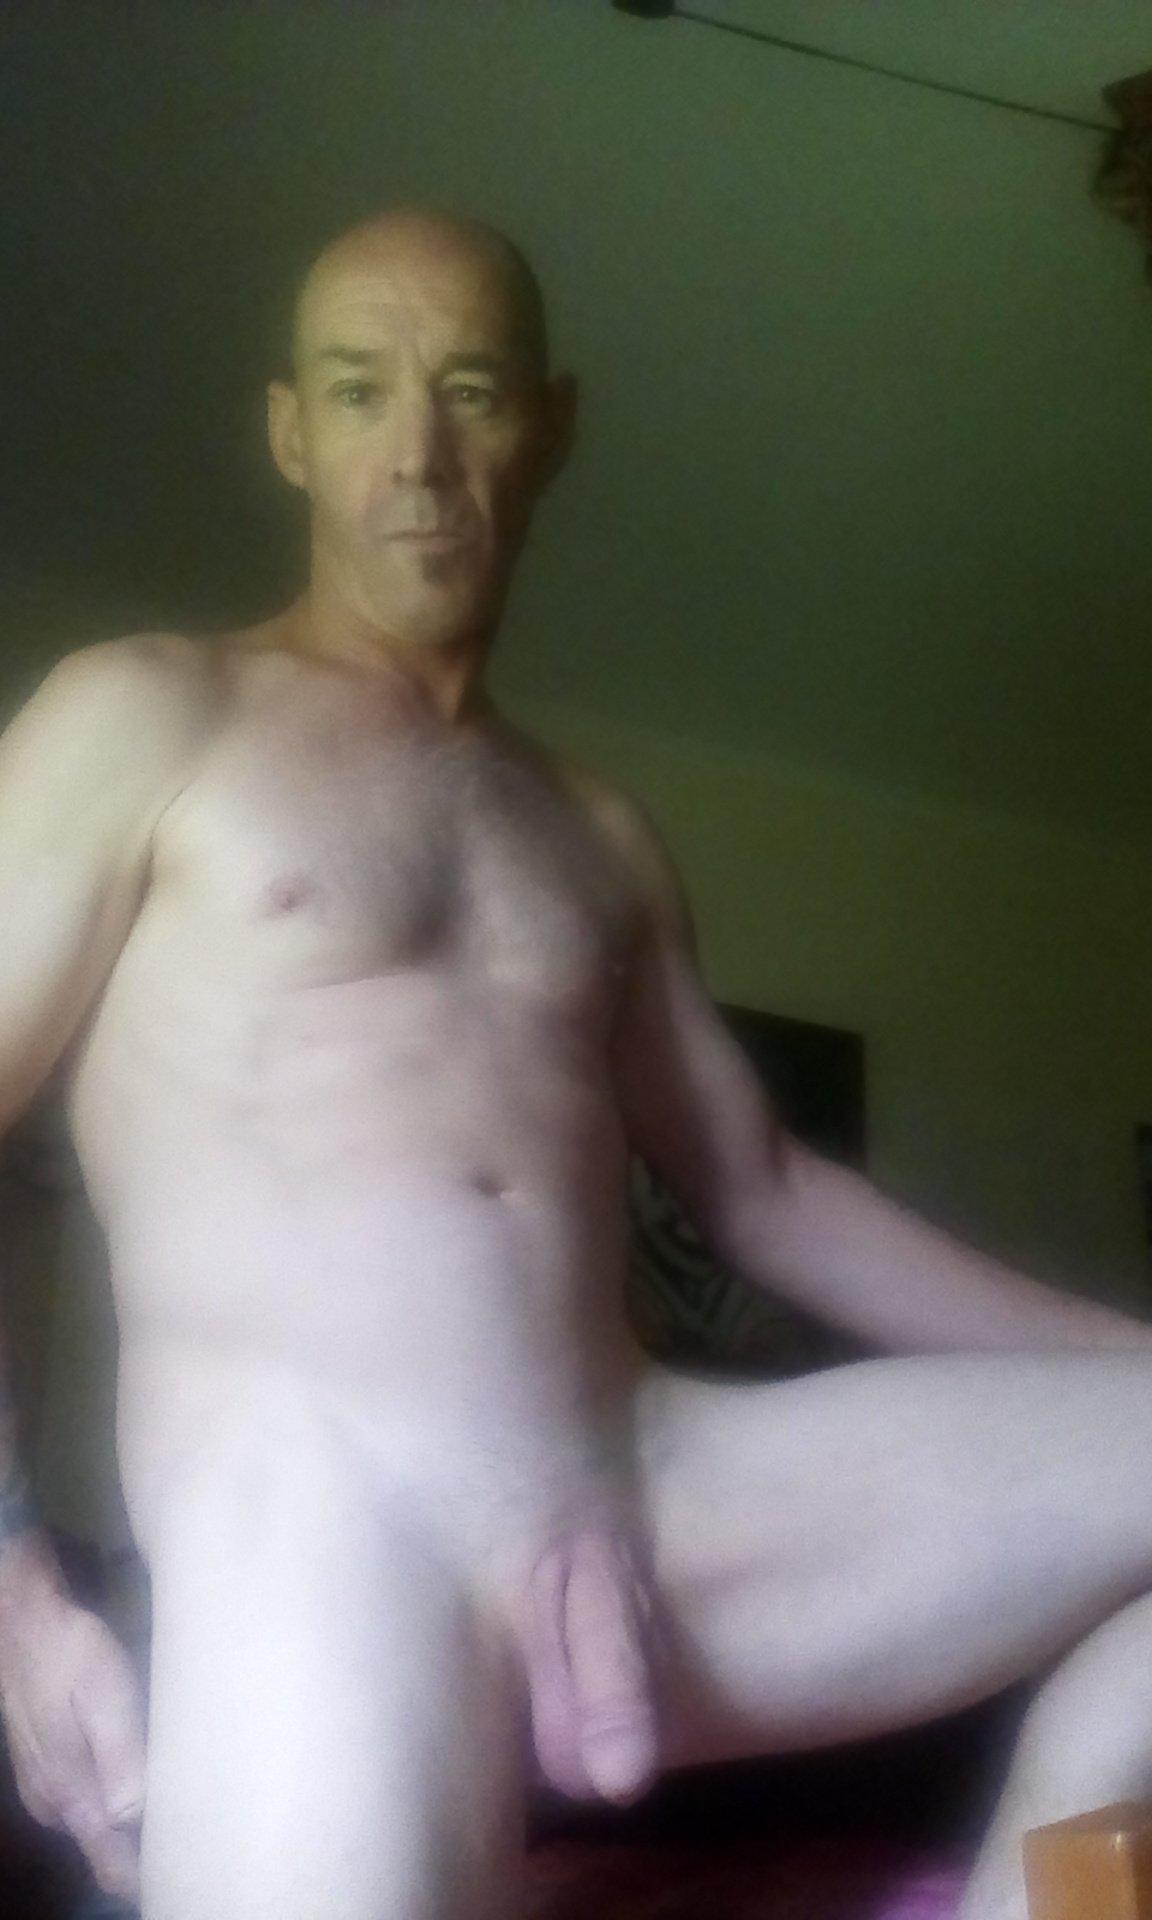 Markanthony from South Australia,Australia